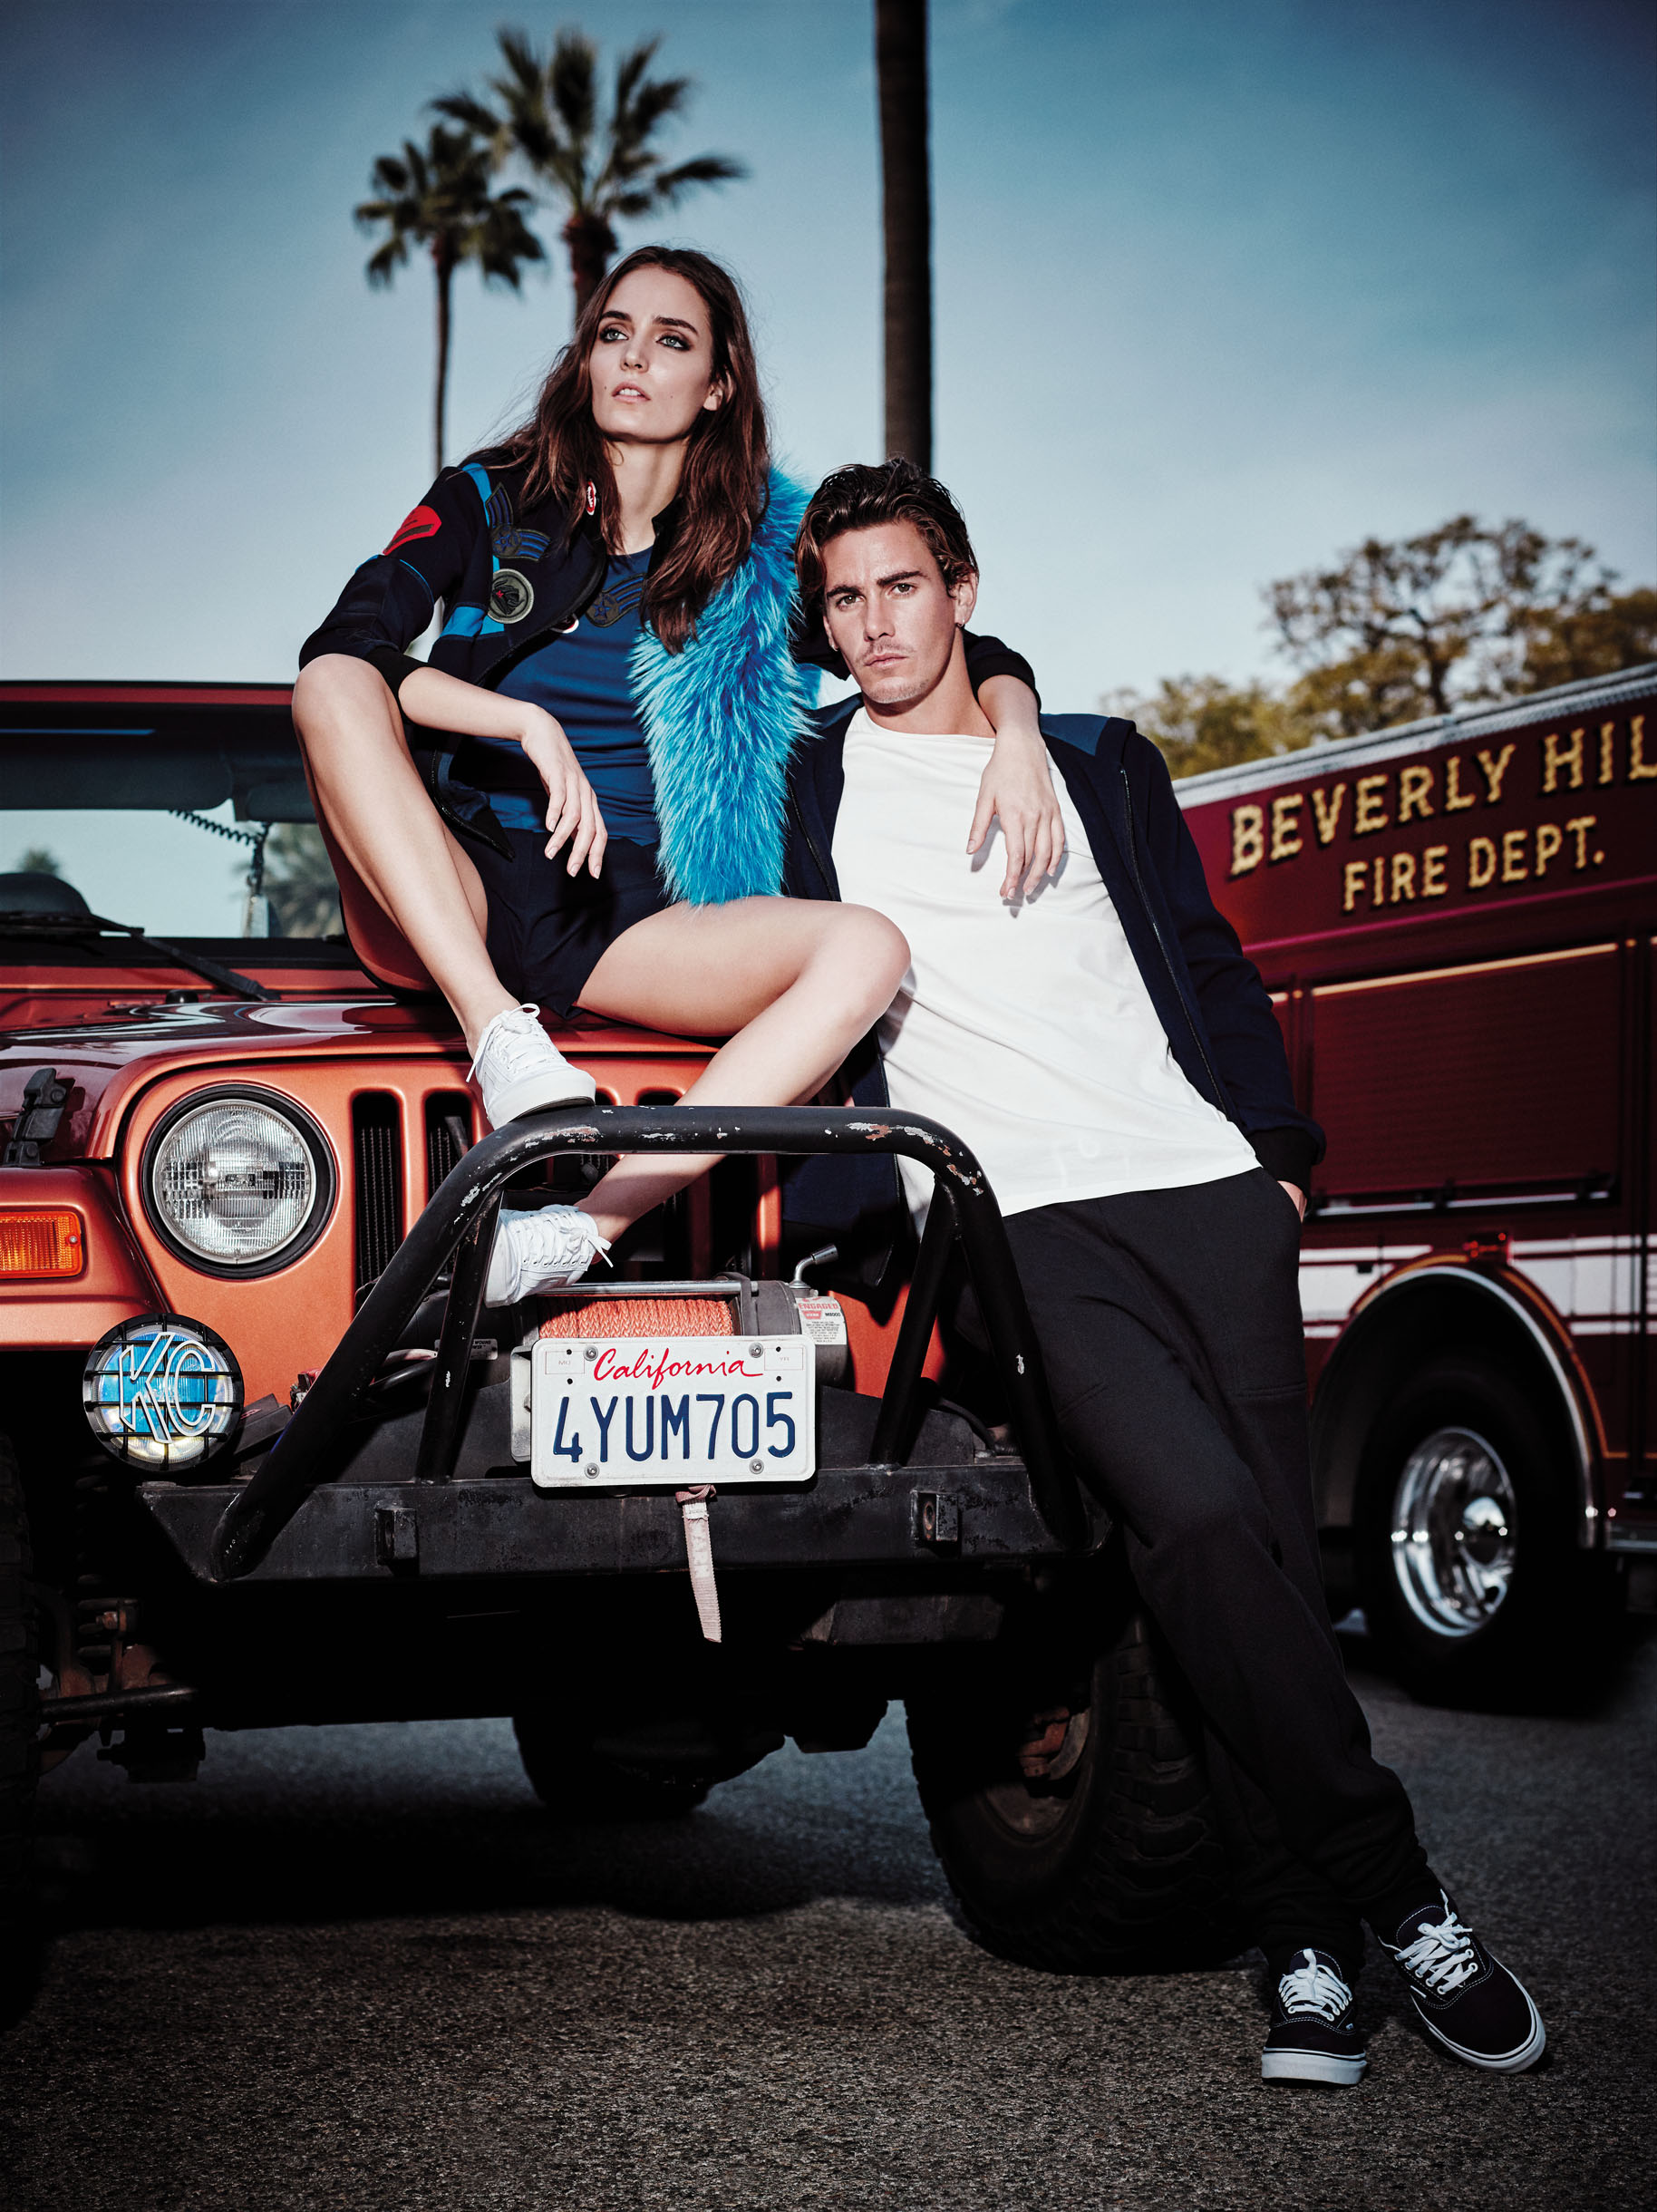 Mr & Mrs SS 2017 Main -Look Book | Matteo Gastel | Mr & Mrs | Numerique Retouch Photo Retouching Studio